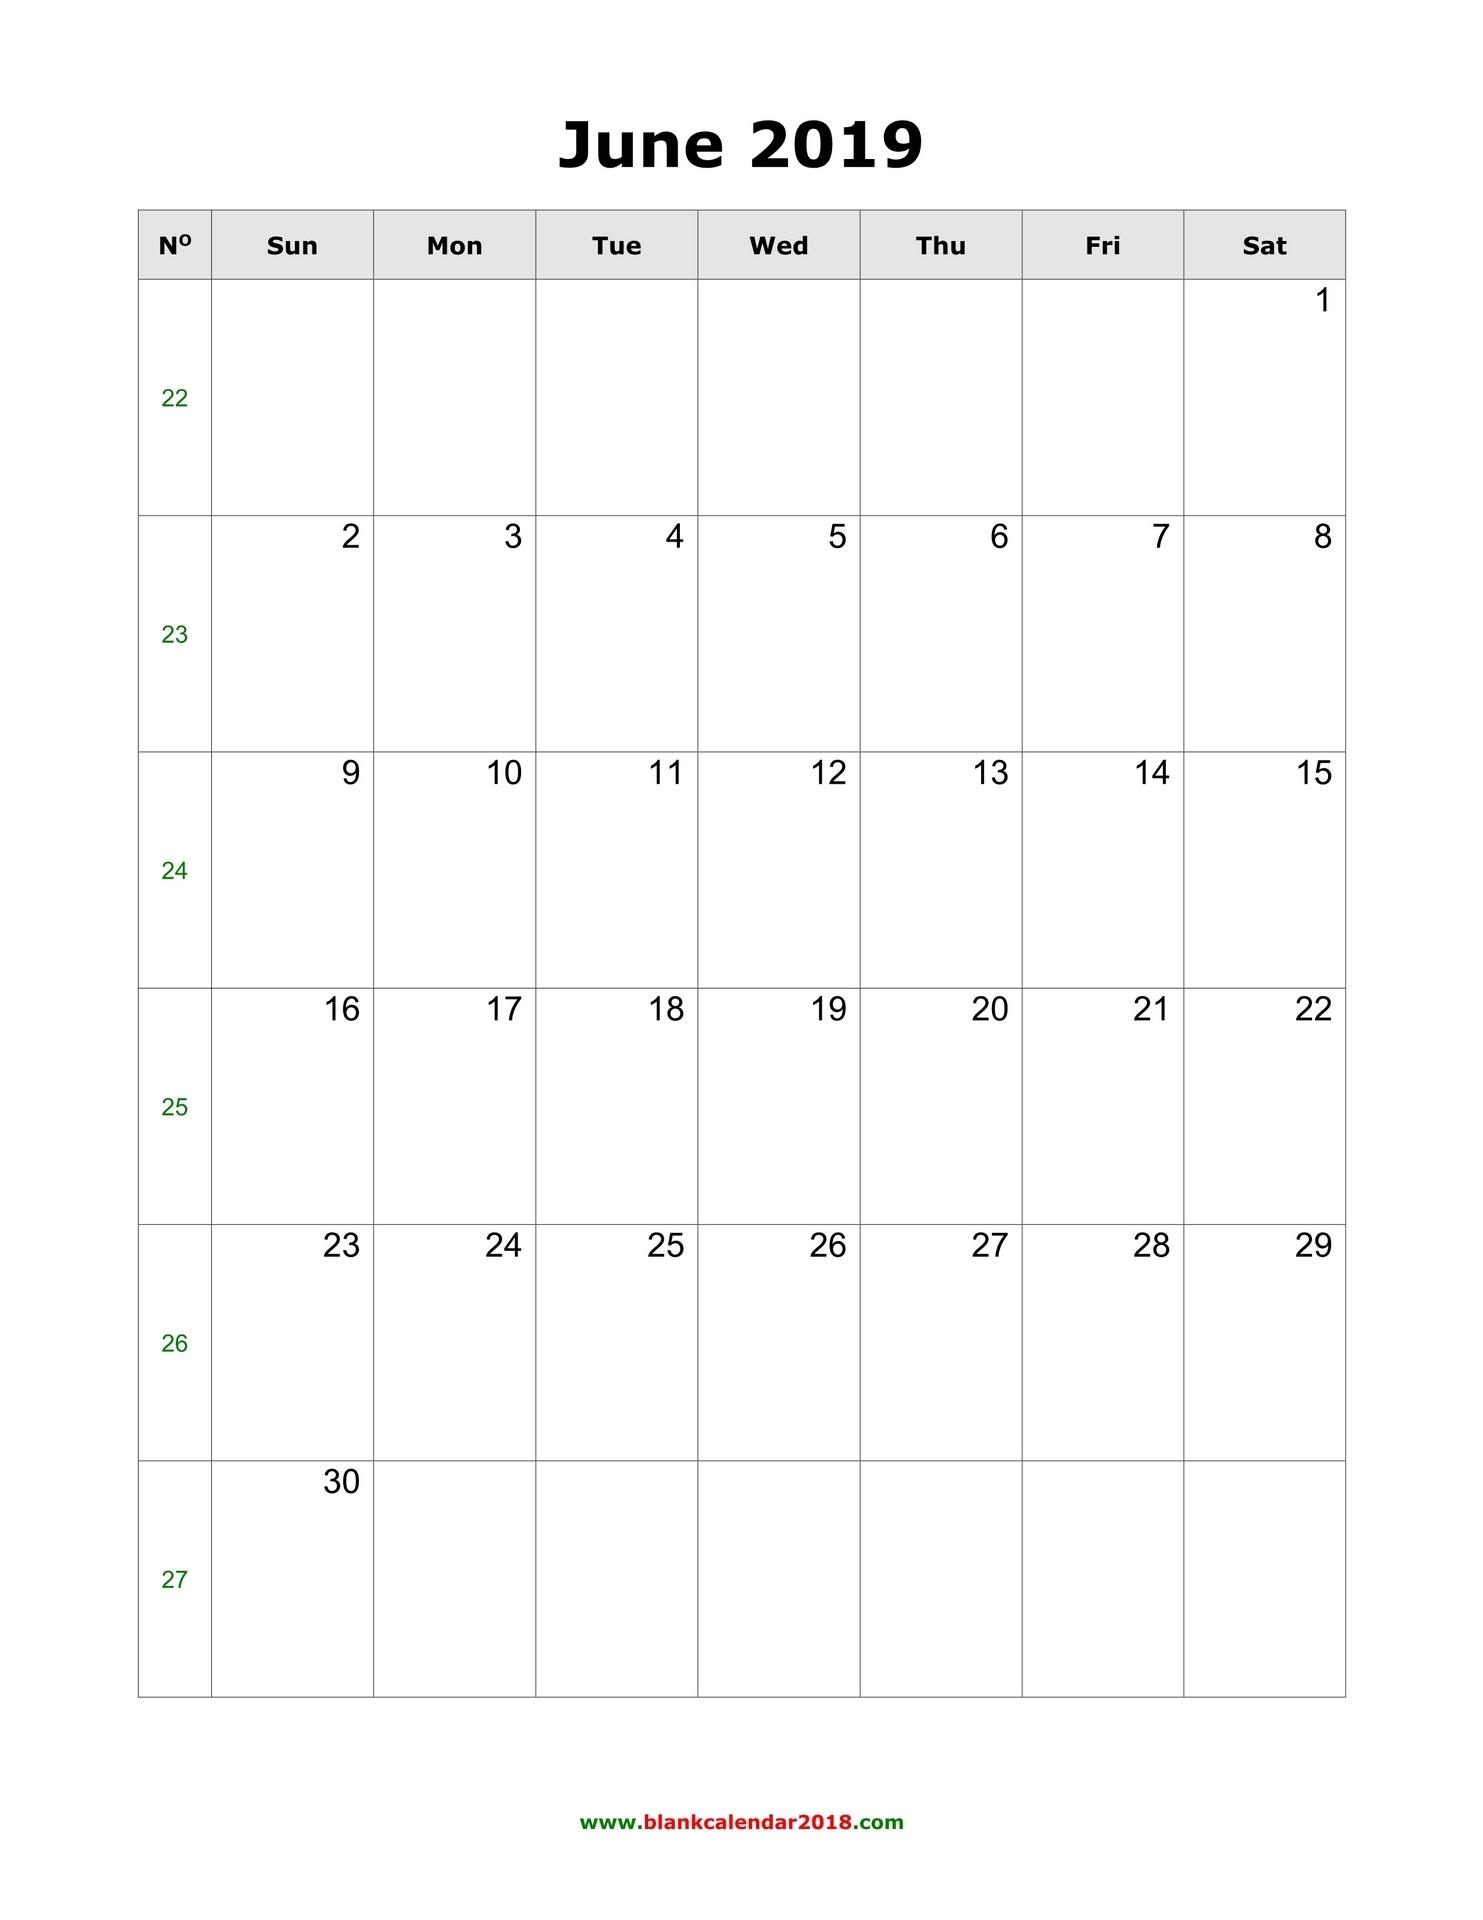 Blank Calendar For June 2019 pertaining to Editable Calendar July 2019-June 2020